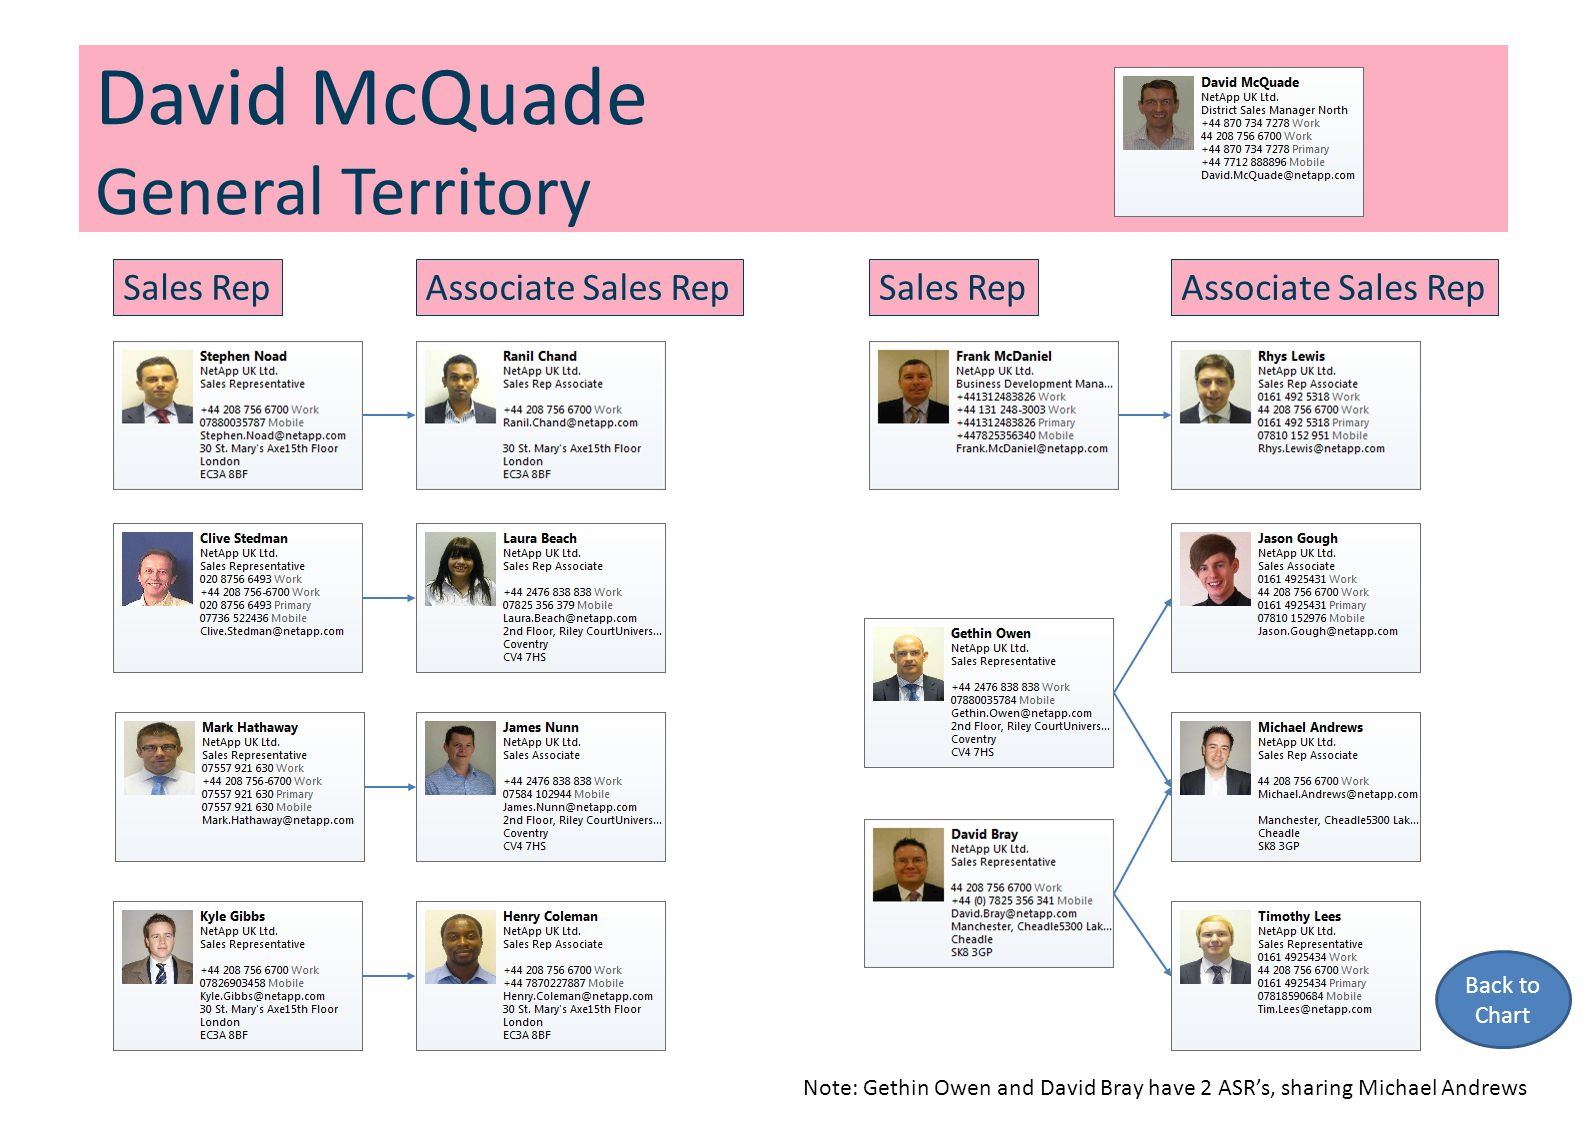 David McQuade General Territory